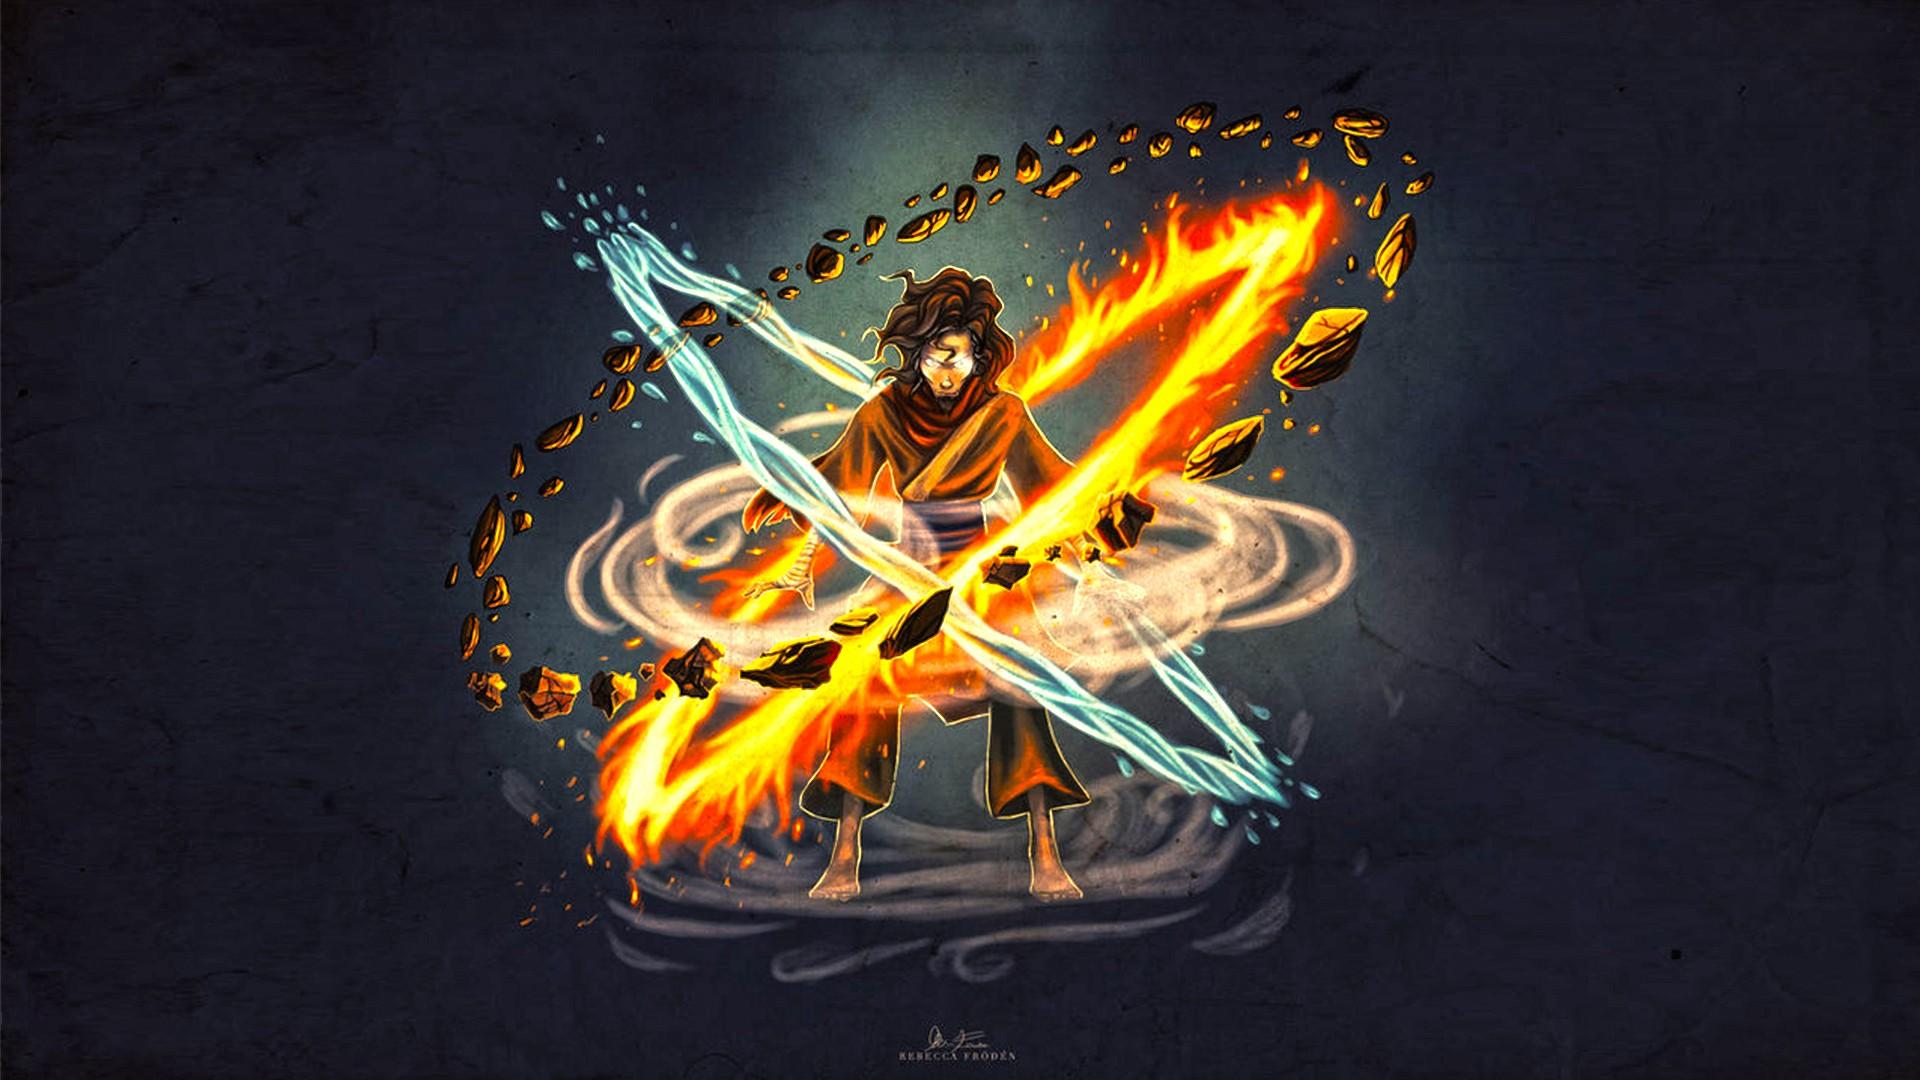 Wallpaper Illustration The Legend Of Korra Avatar Wan Light